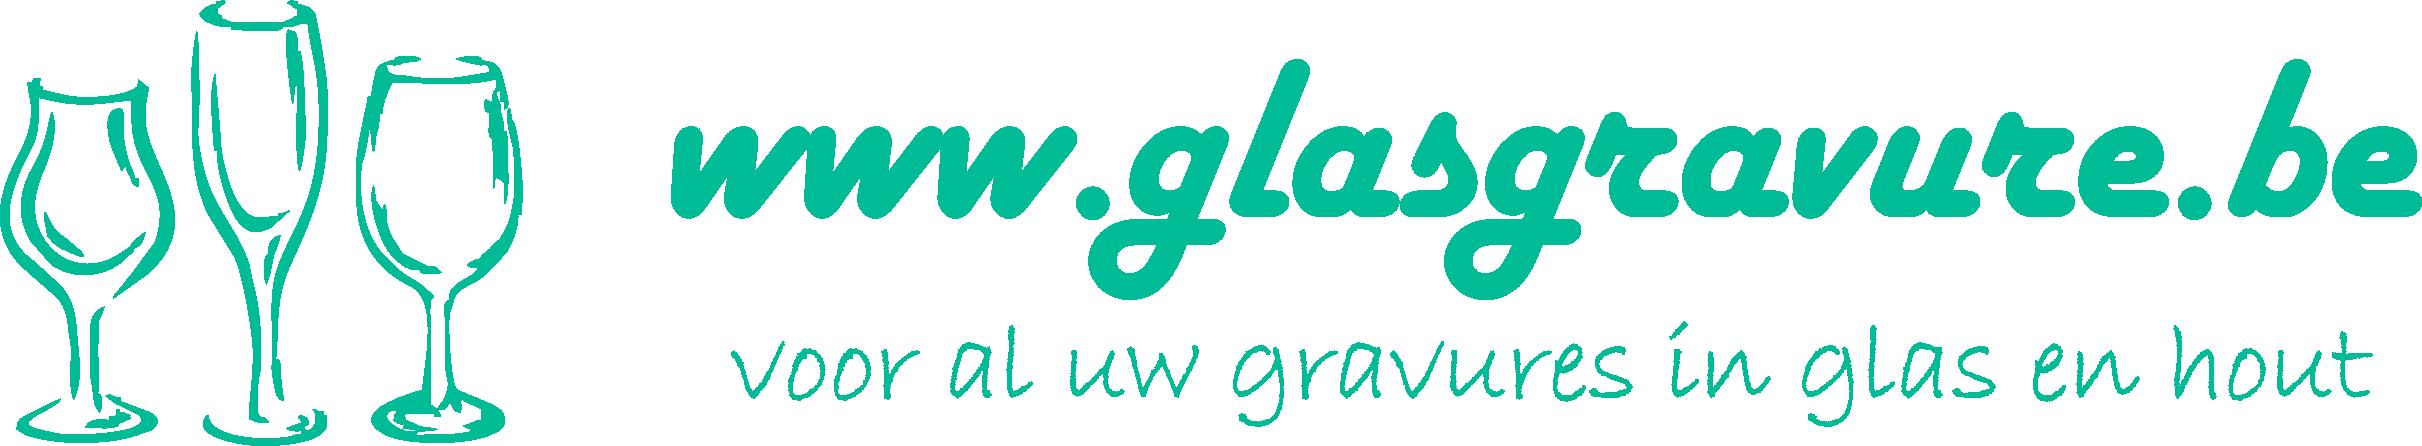 Glasgravure